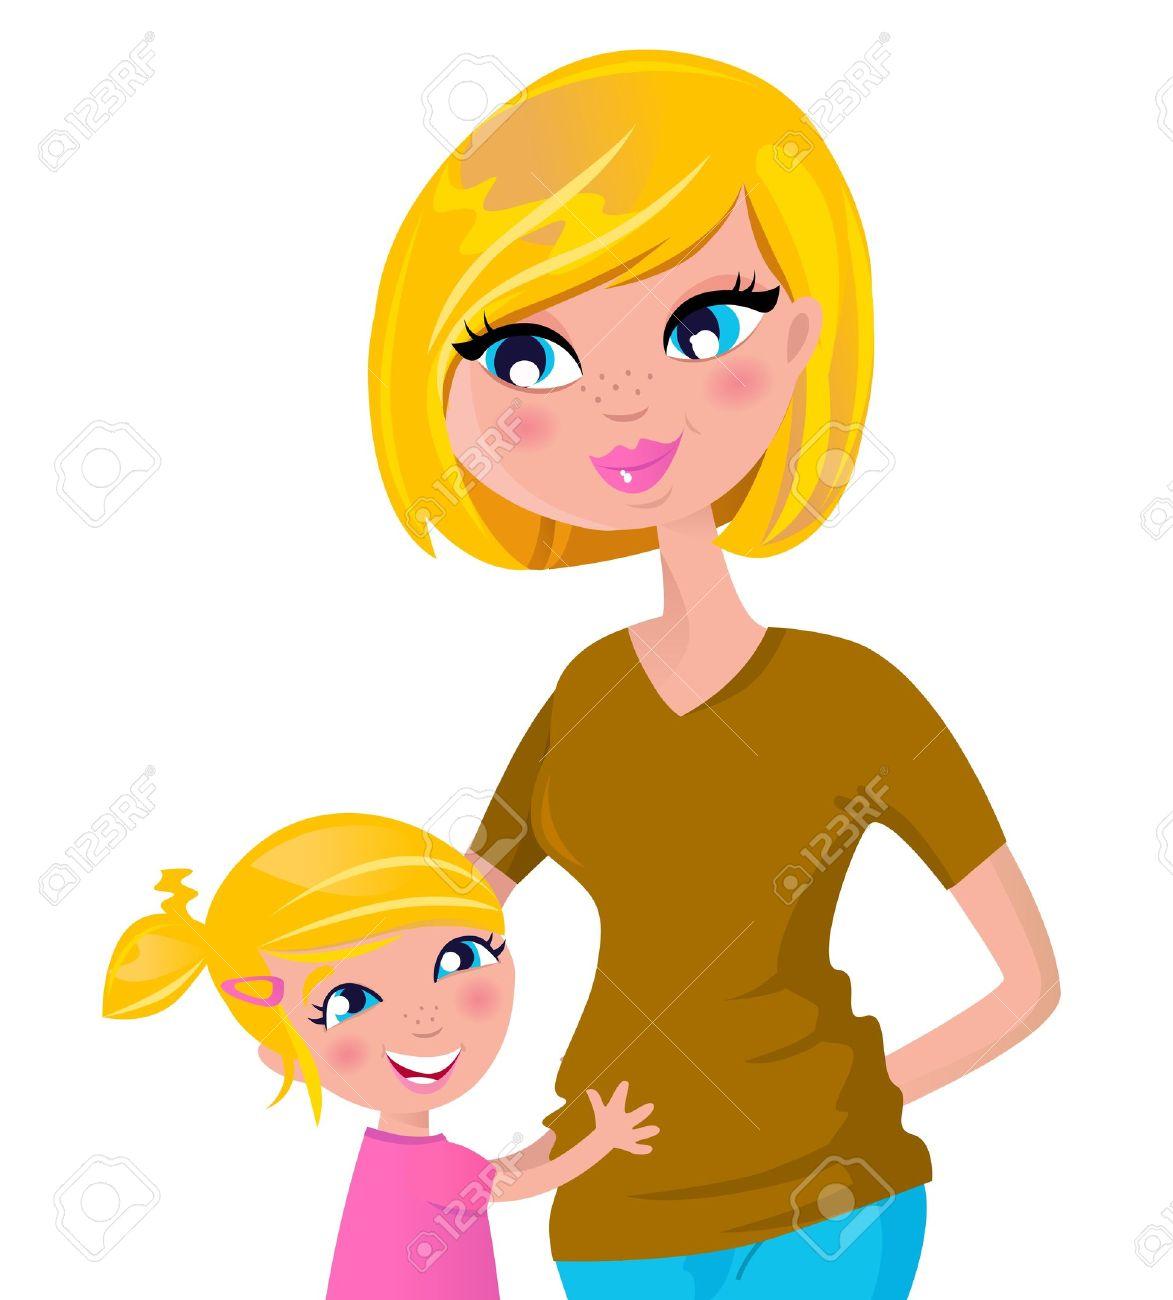 Mother Hugs Her Child. Vector Cartoon Illustration. Royalty Free.